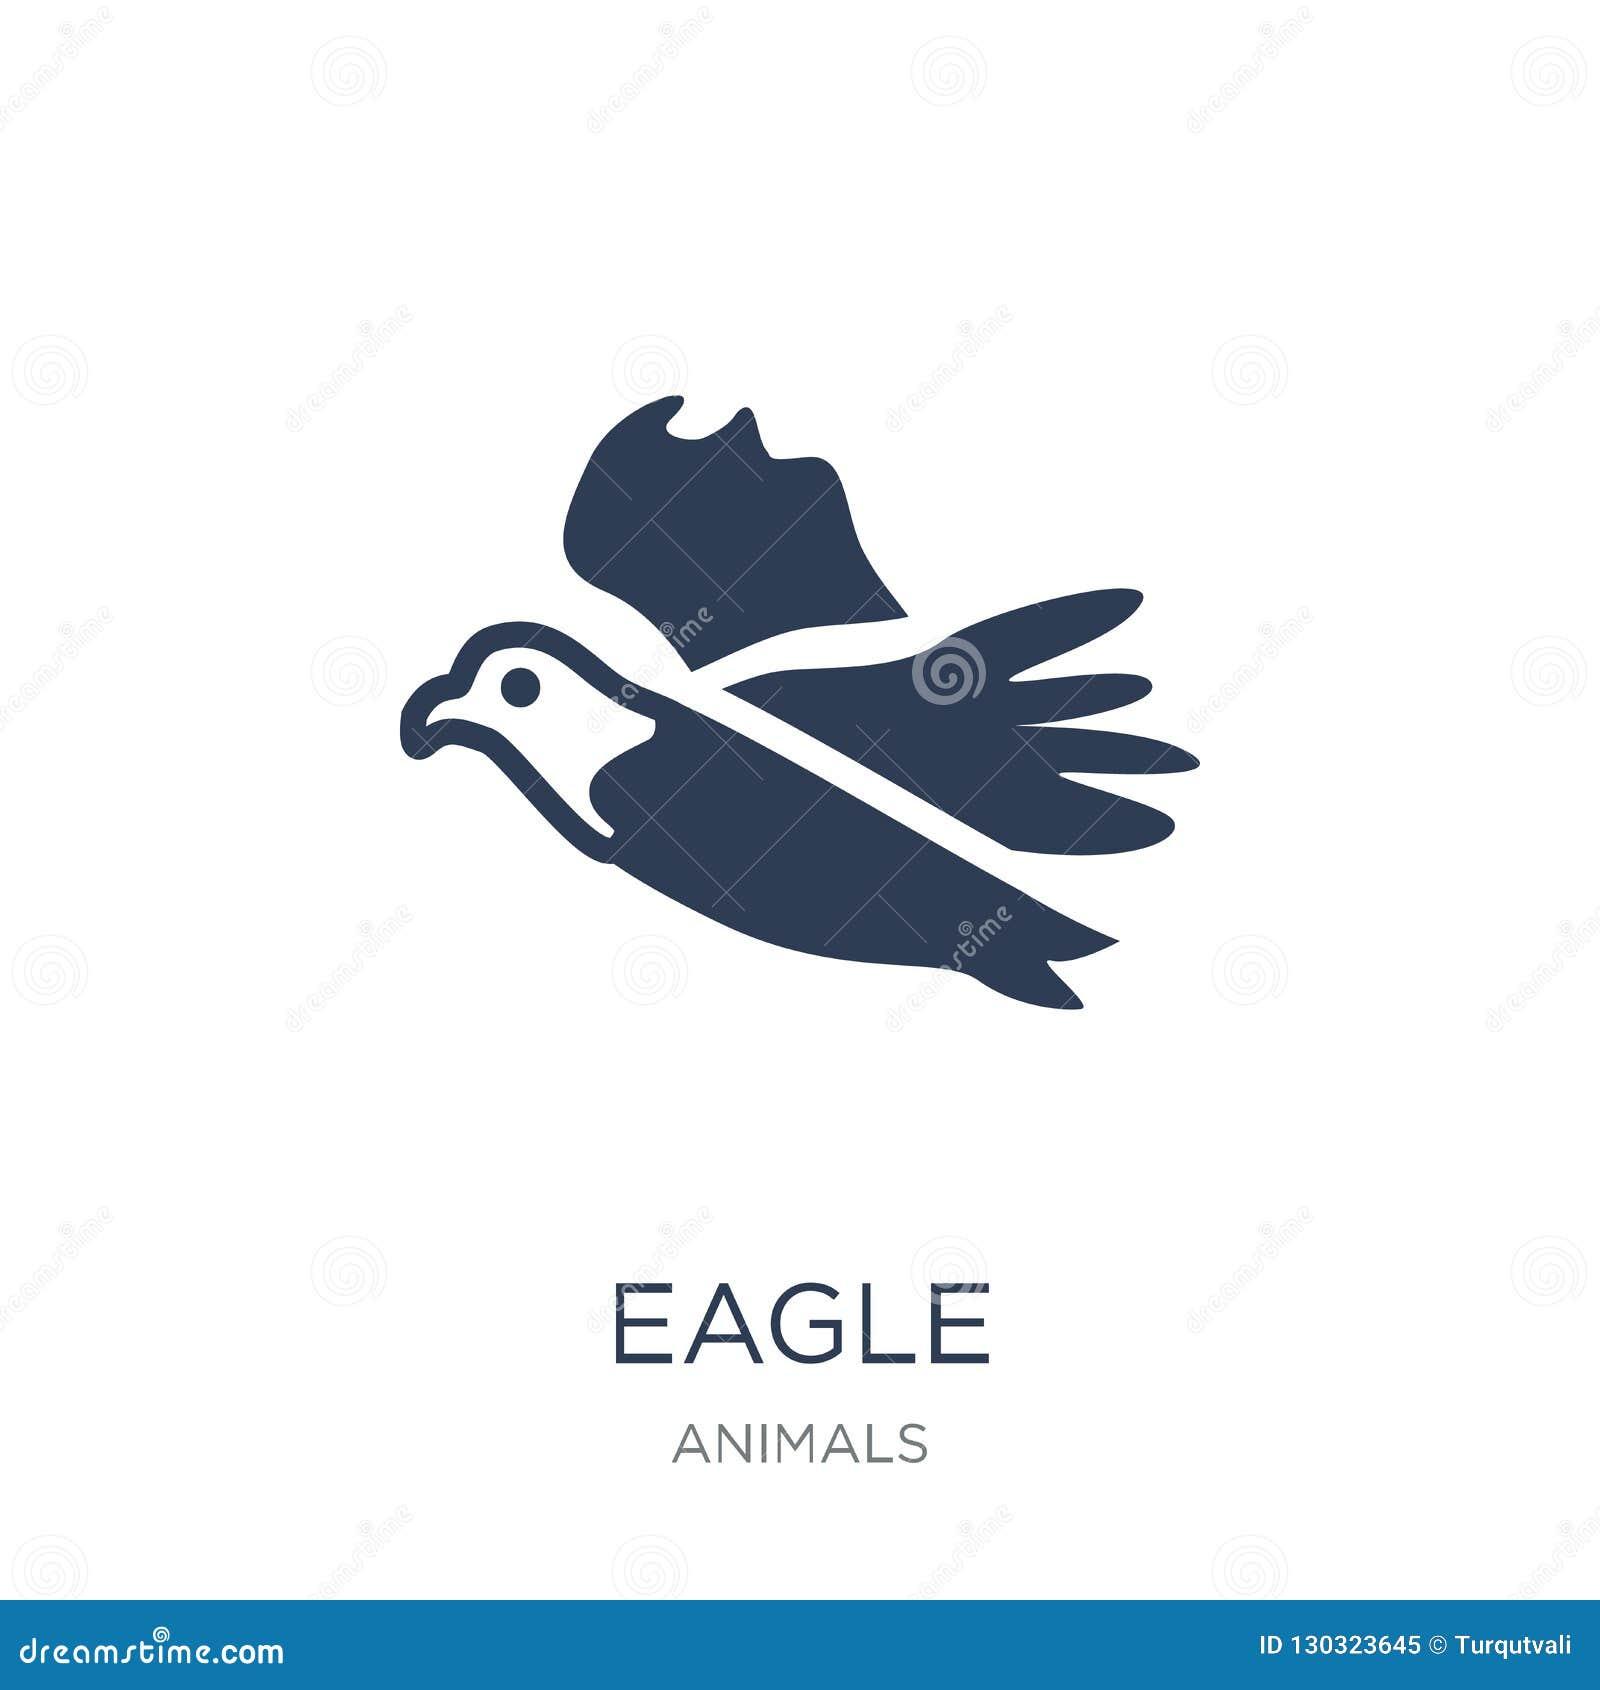 Eagle Icon In vlak vectoreagle-pictogram op witte achtergrond Fr